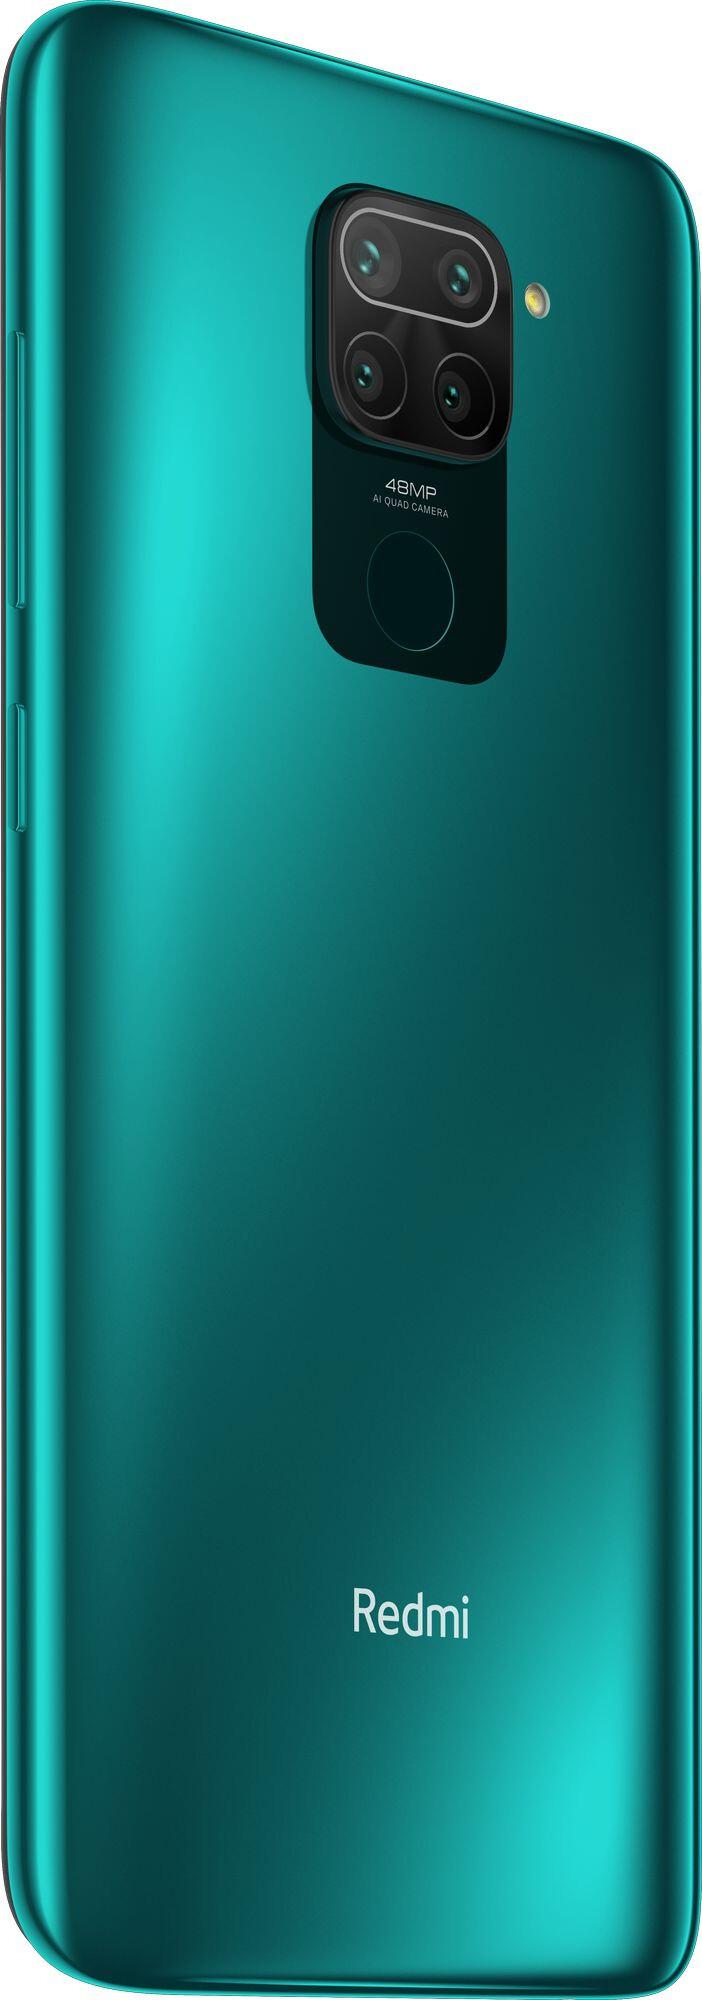 Xiaomi Redmi Note 9 3GB/64GB green - 4